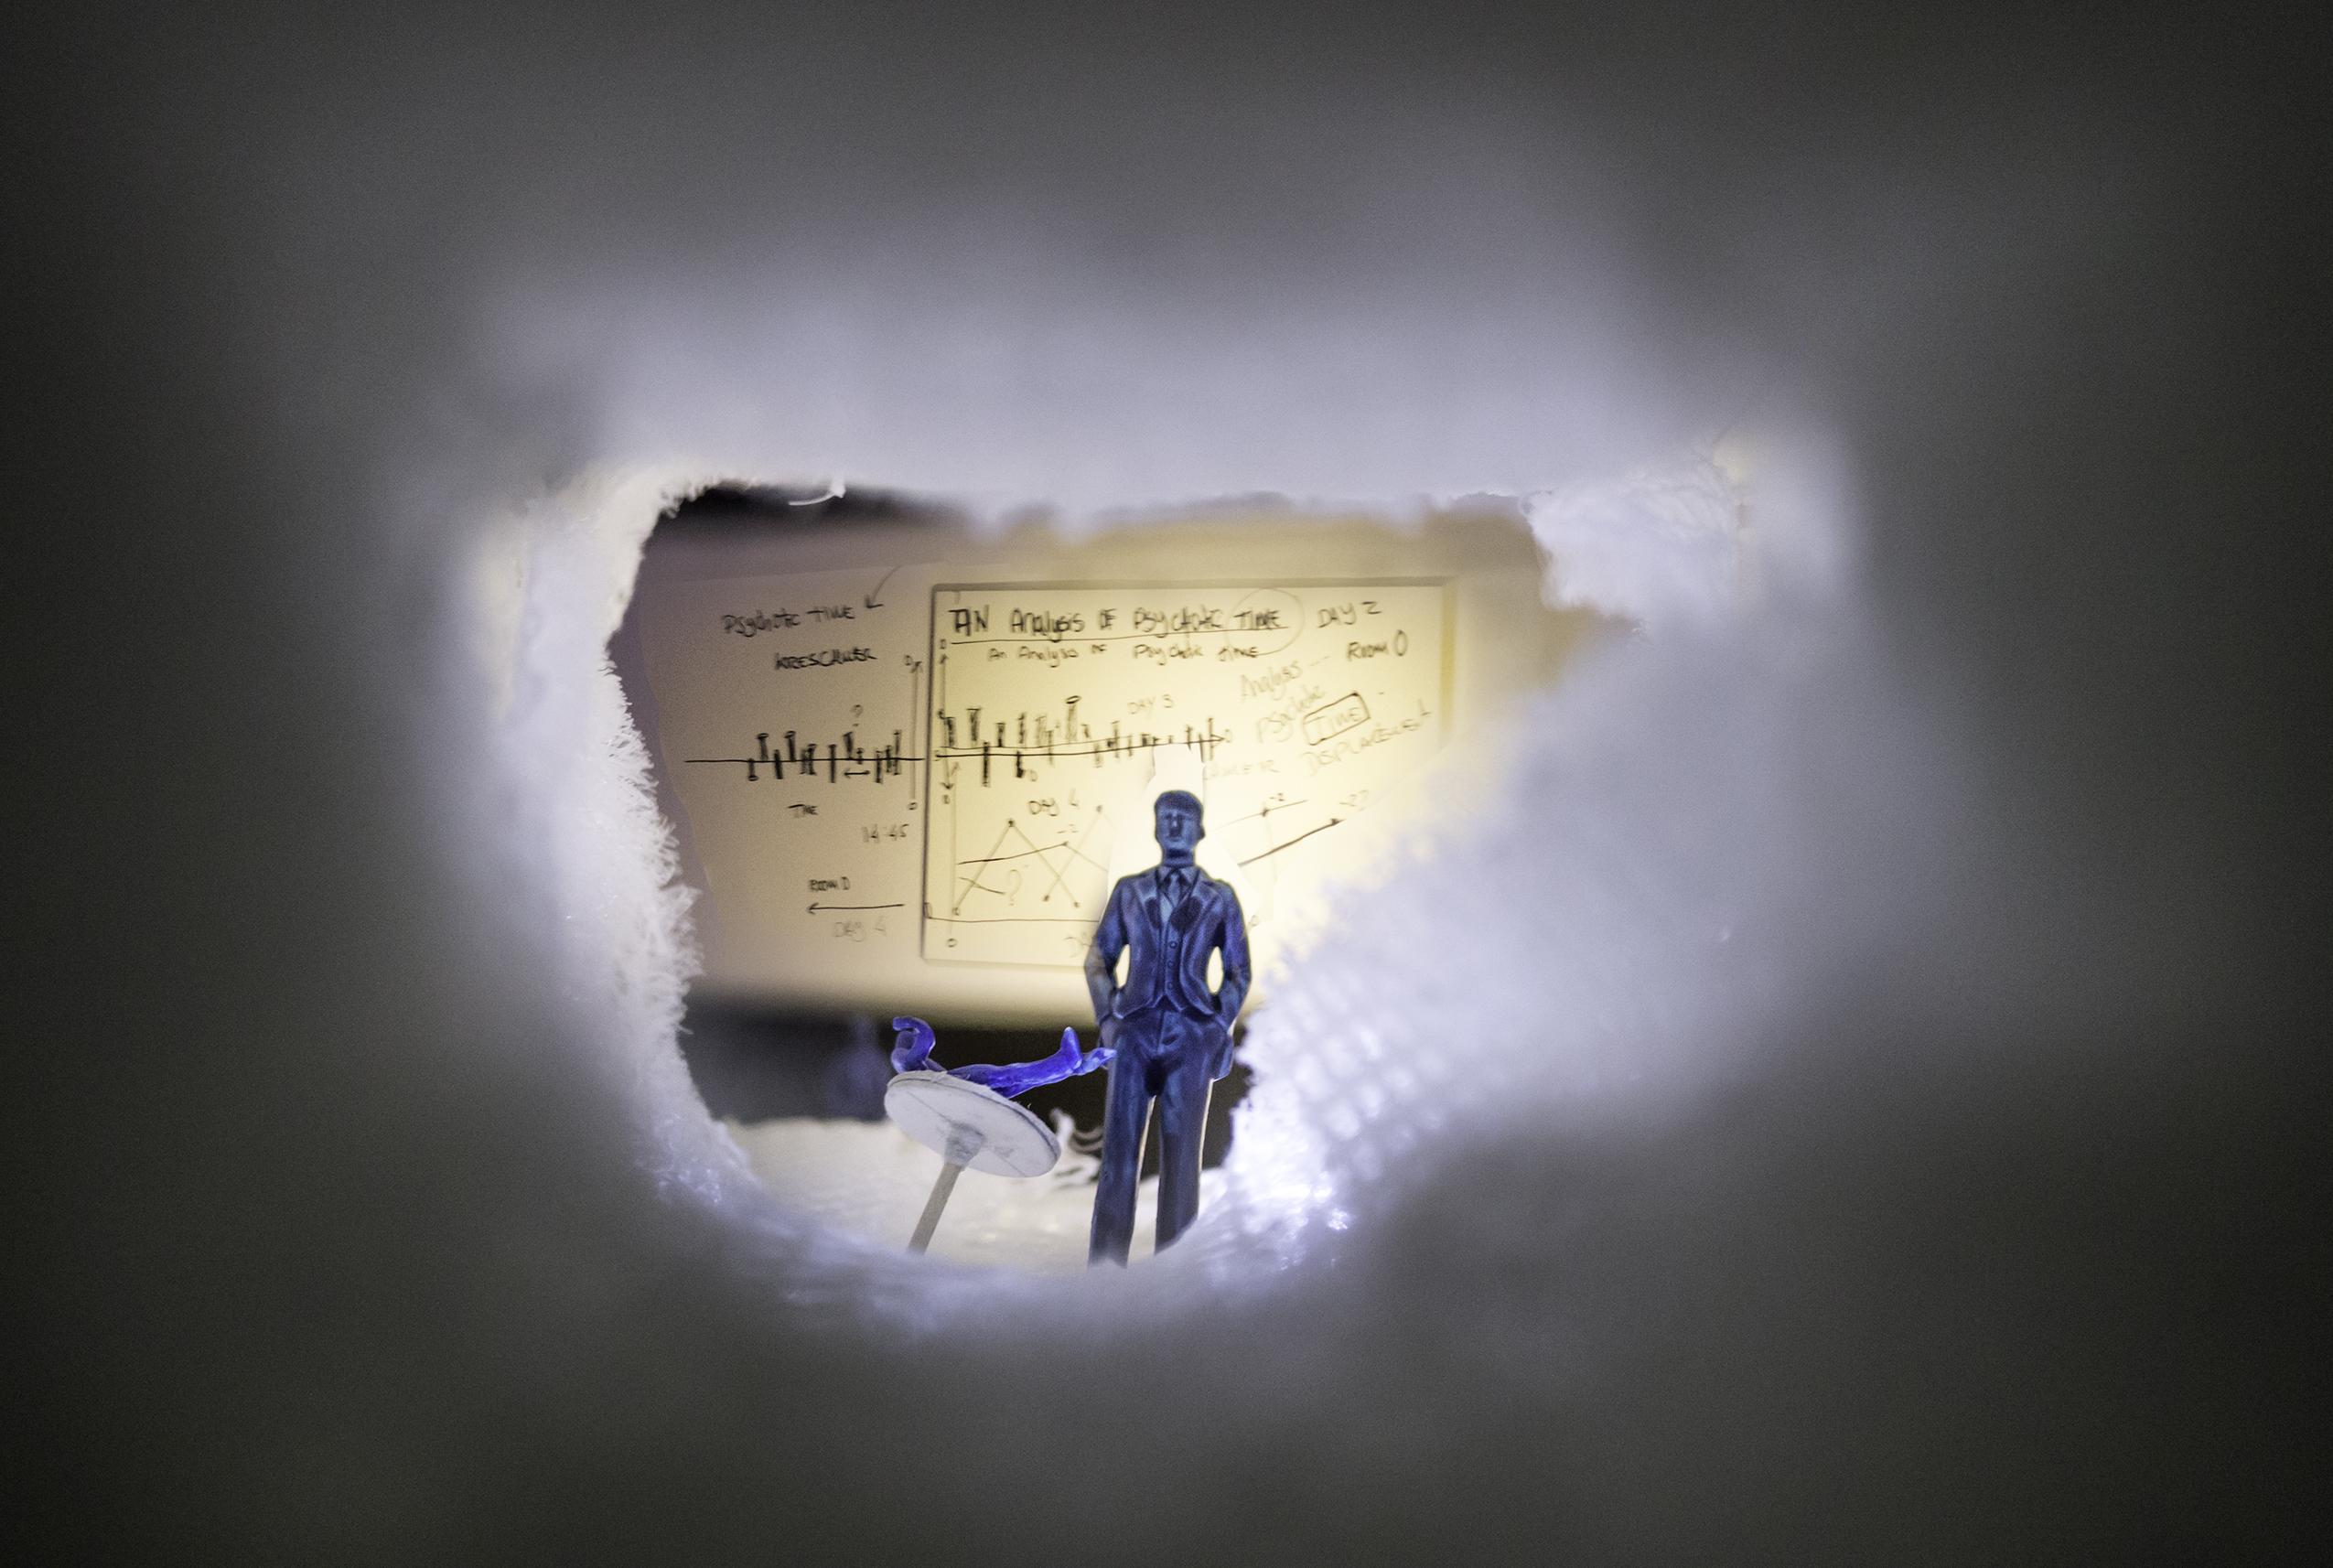 ZONE OF TERROR_blue man_SofiaEsquivel